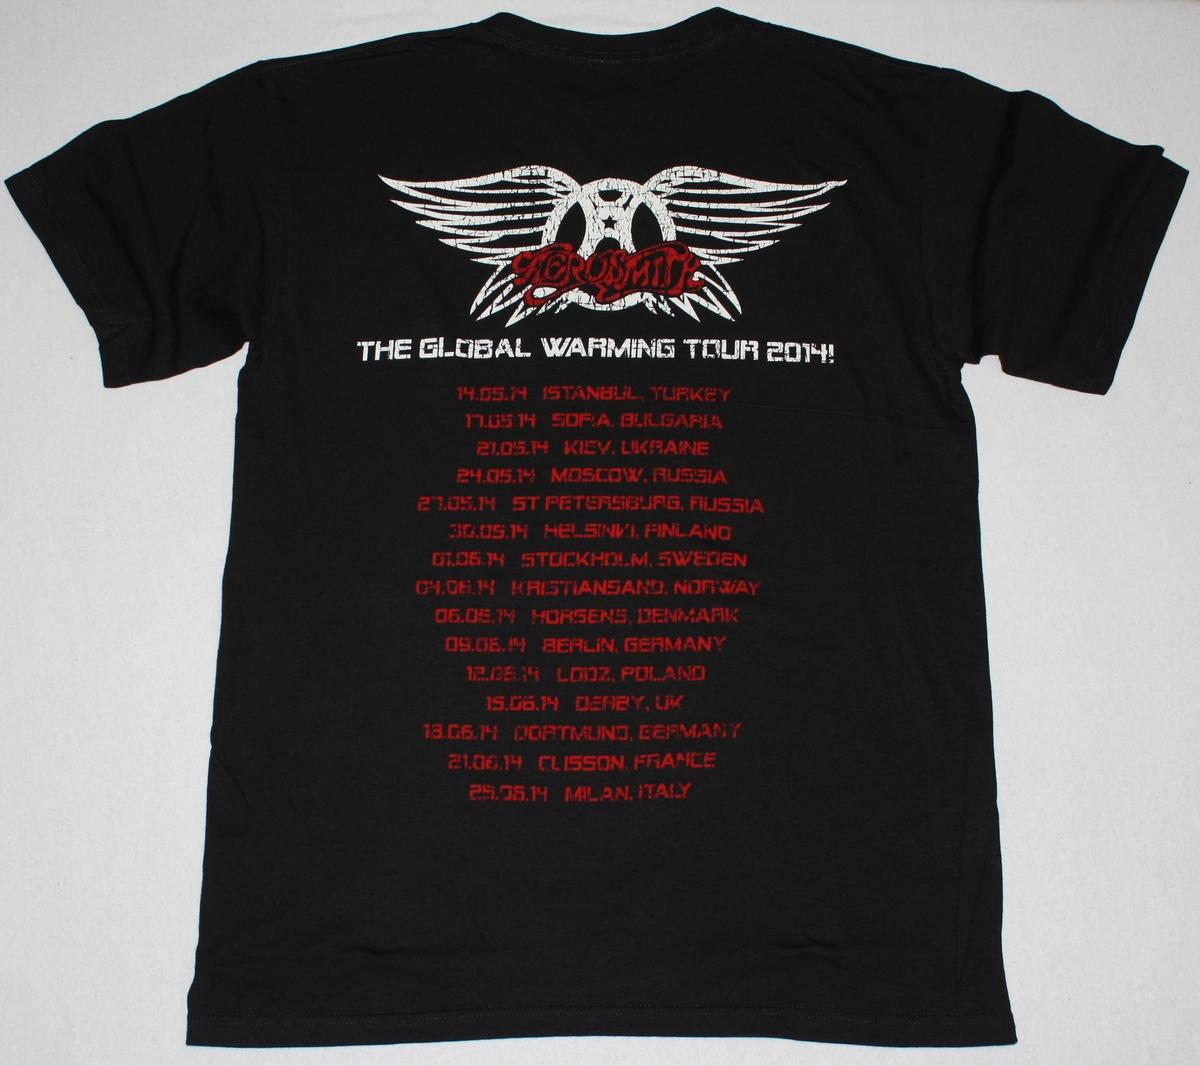 AEROSMITH AERO FORCE ONE THE GLOBAL WARMING TOUR 2014 EUROPE NEW BLACK TSHIRT